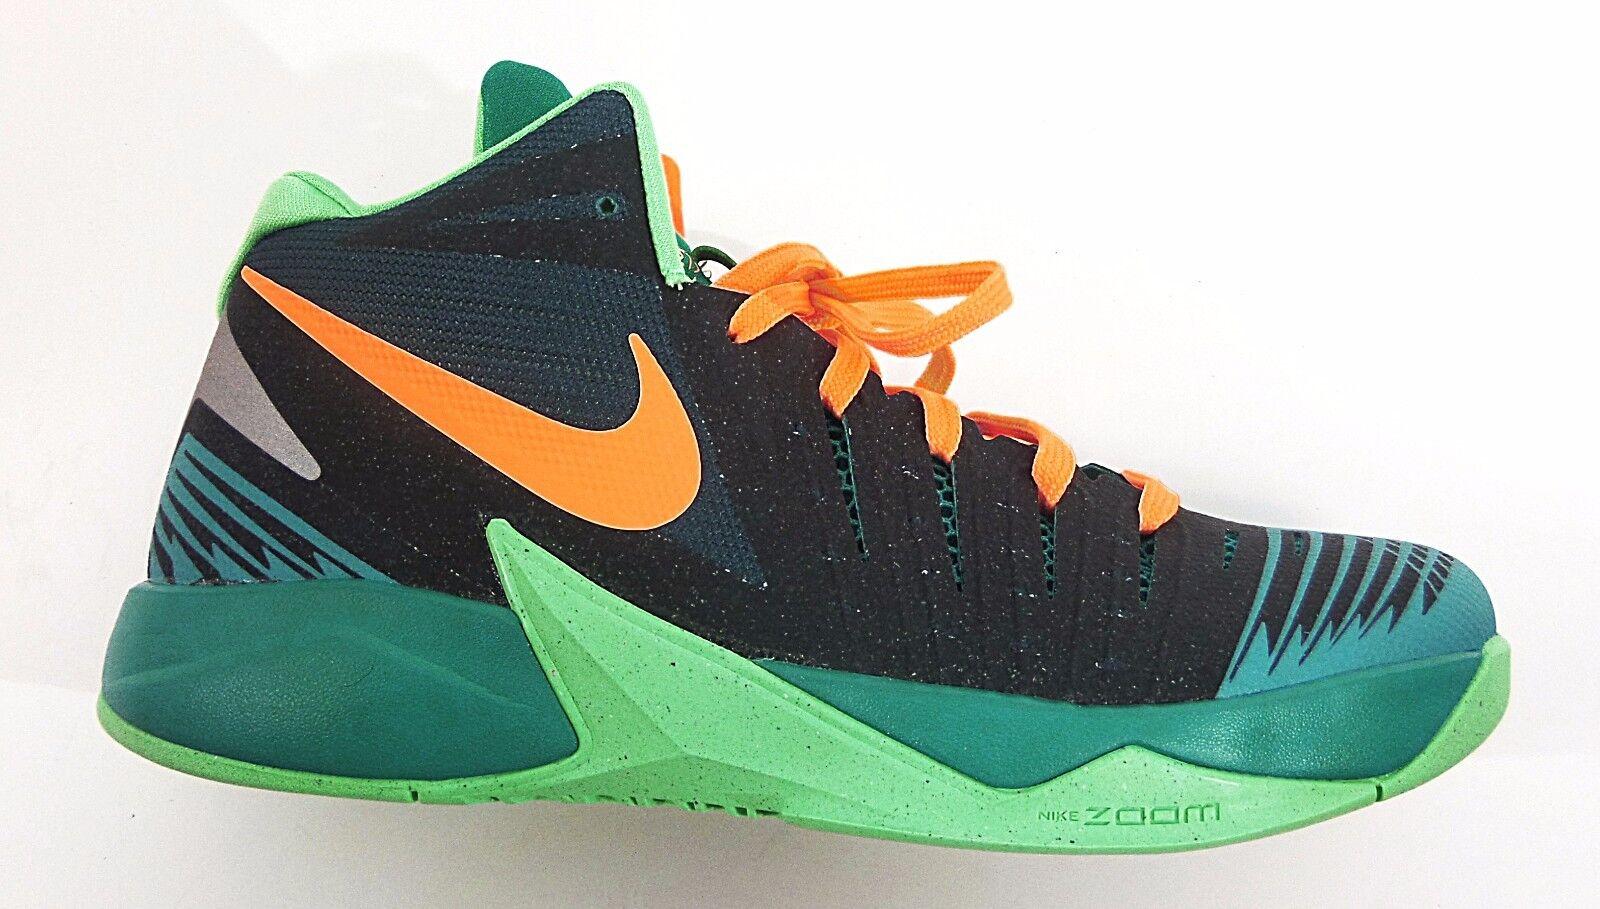 Nike Uomo ZOOM I GET BUCKETS Shoes Mango/Green 643300-300 a1